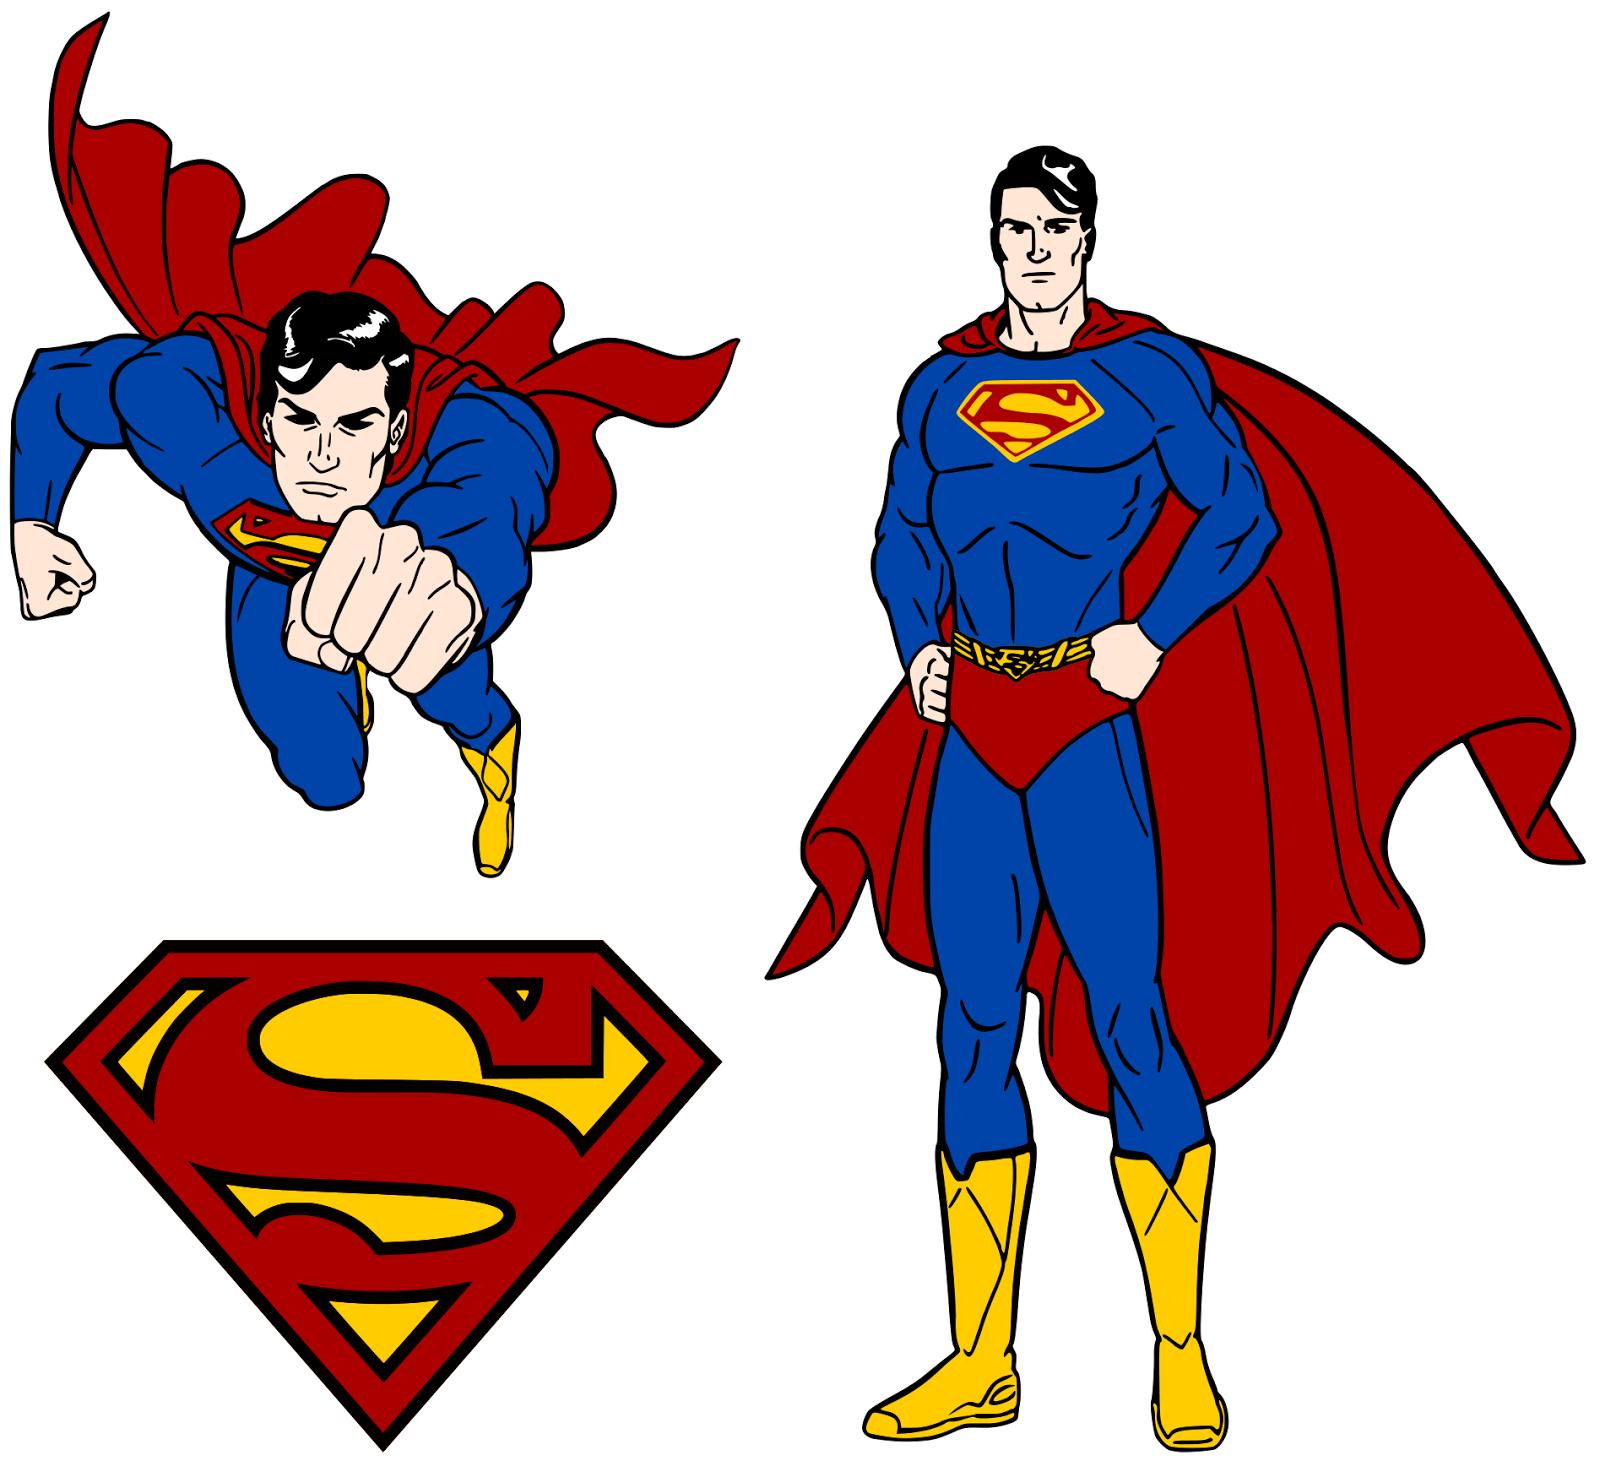 Krafty Nook Superman Svg Files He S My Super Hero Krafty Nook Superman Poster Superman